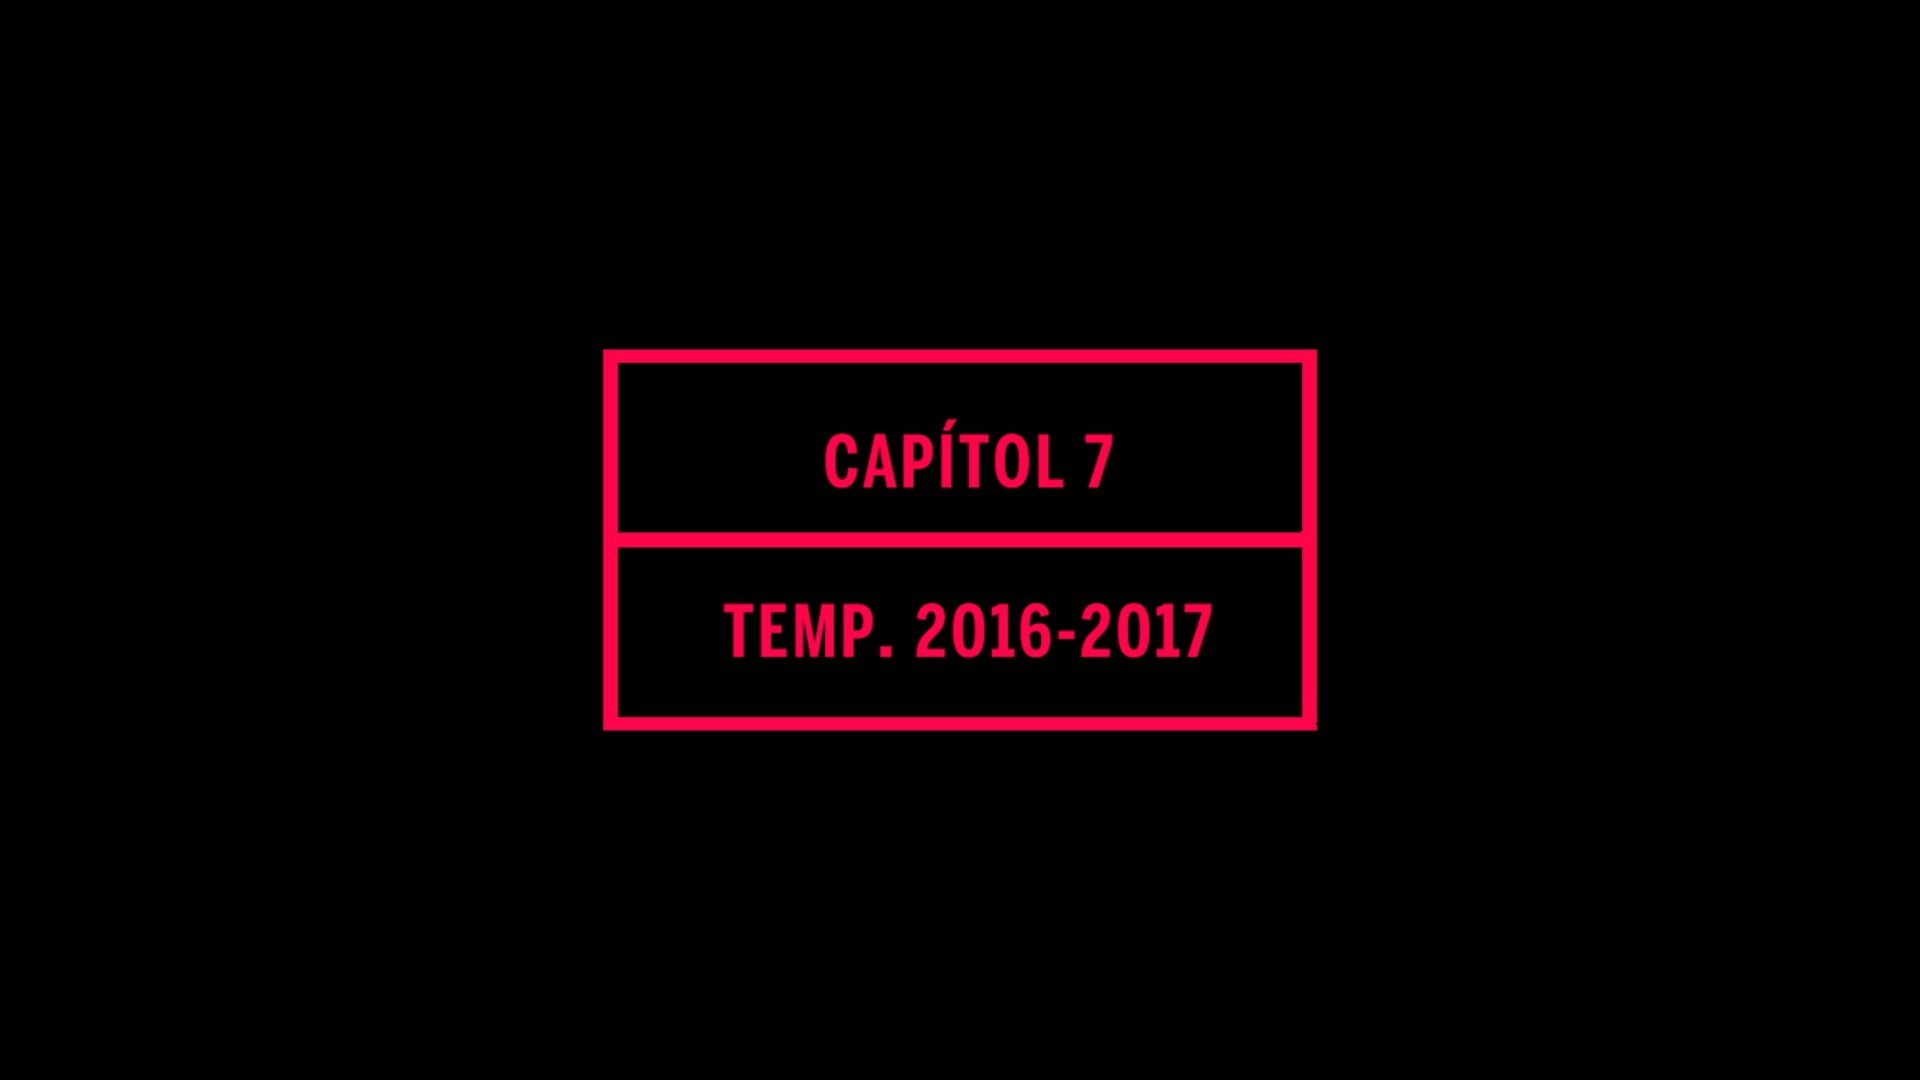 Capítol 07 - Temporada SF 16/17